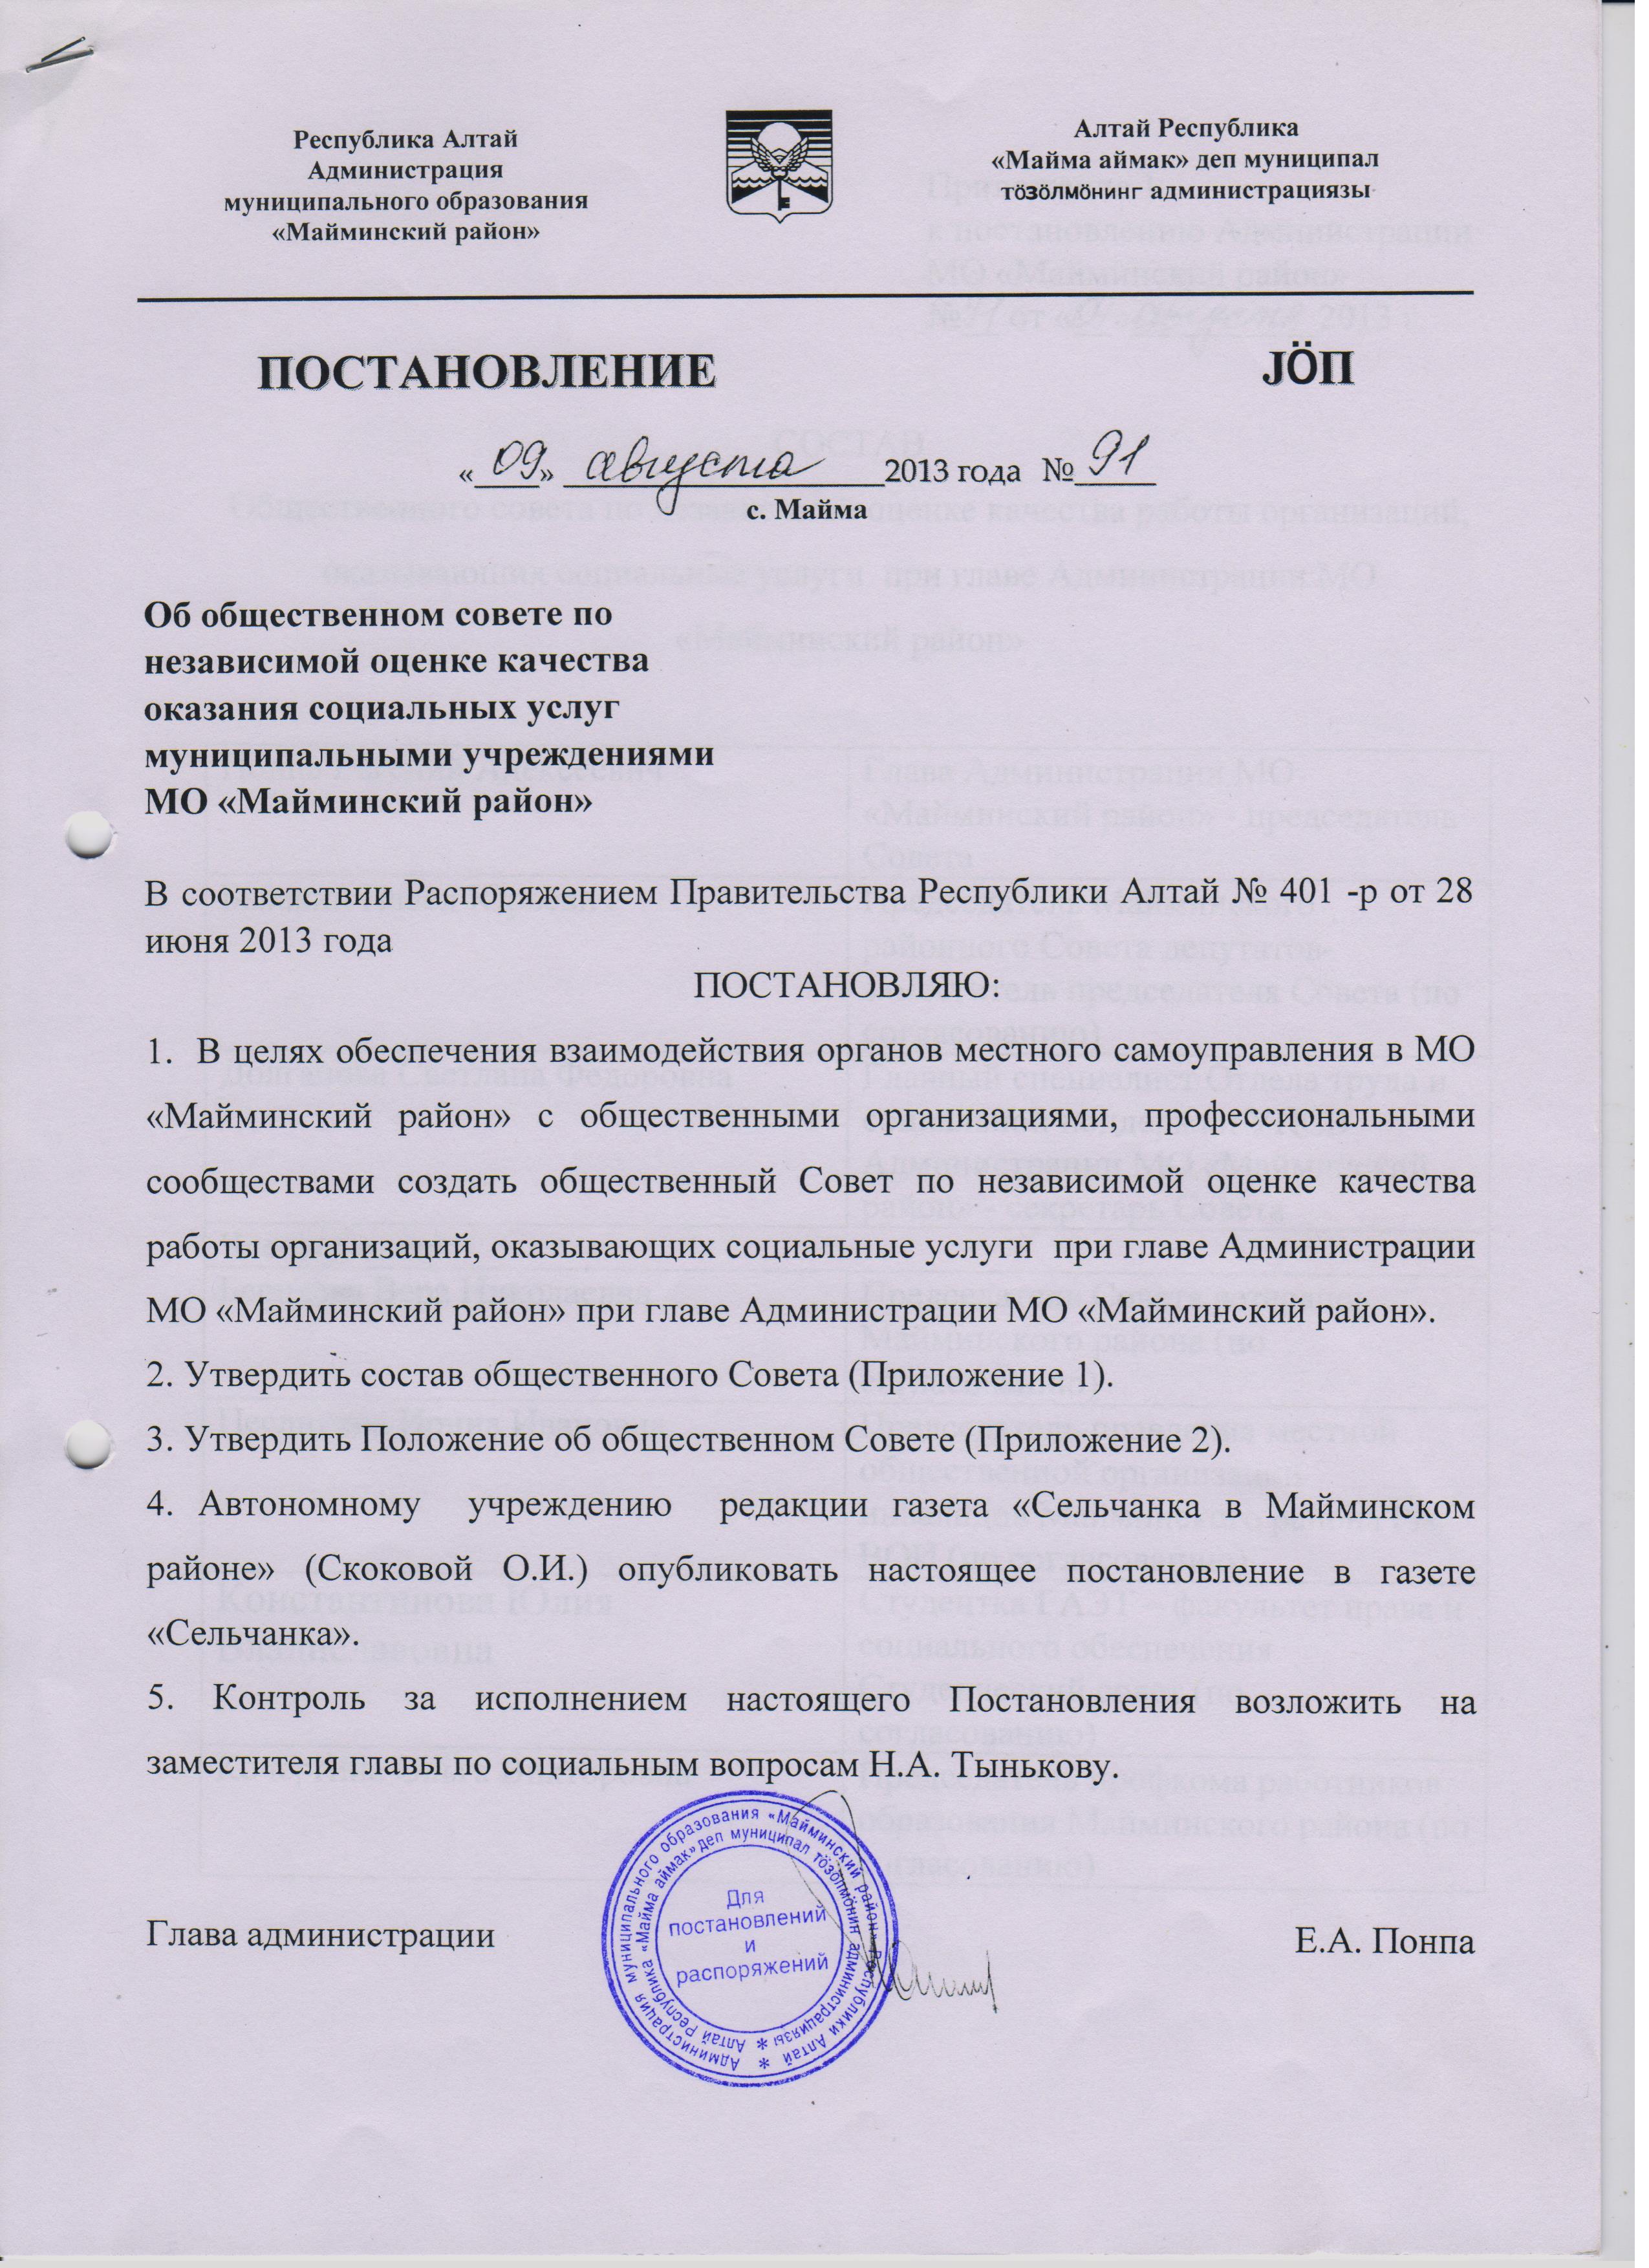 Приказу 3 к приказу 297 от 01.04.2013 департамента здравоохранения